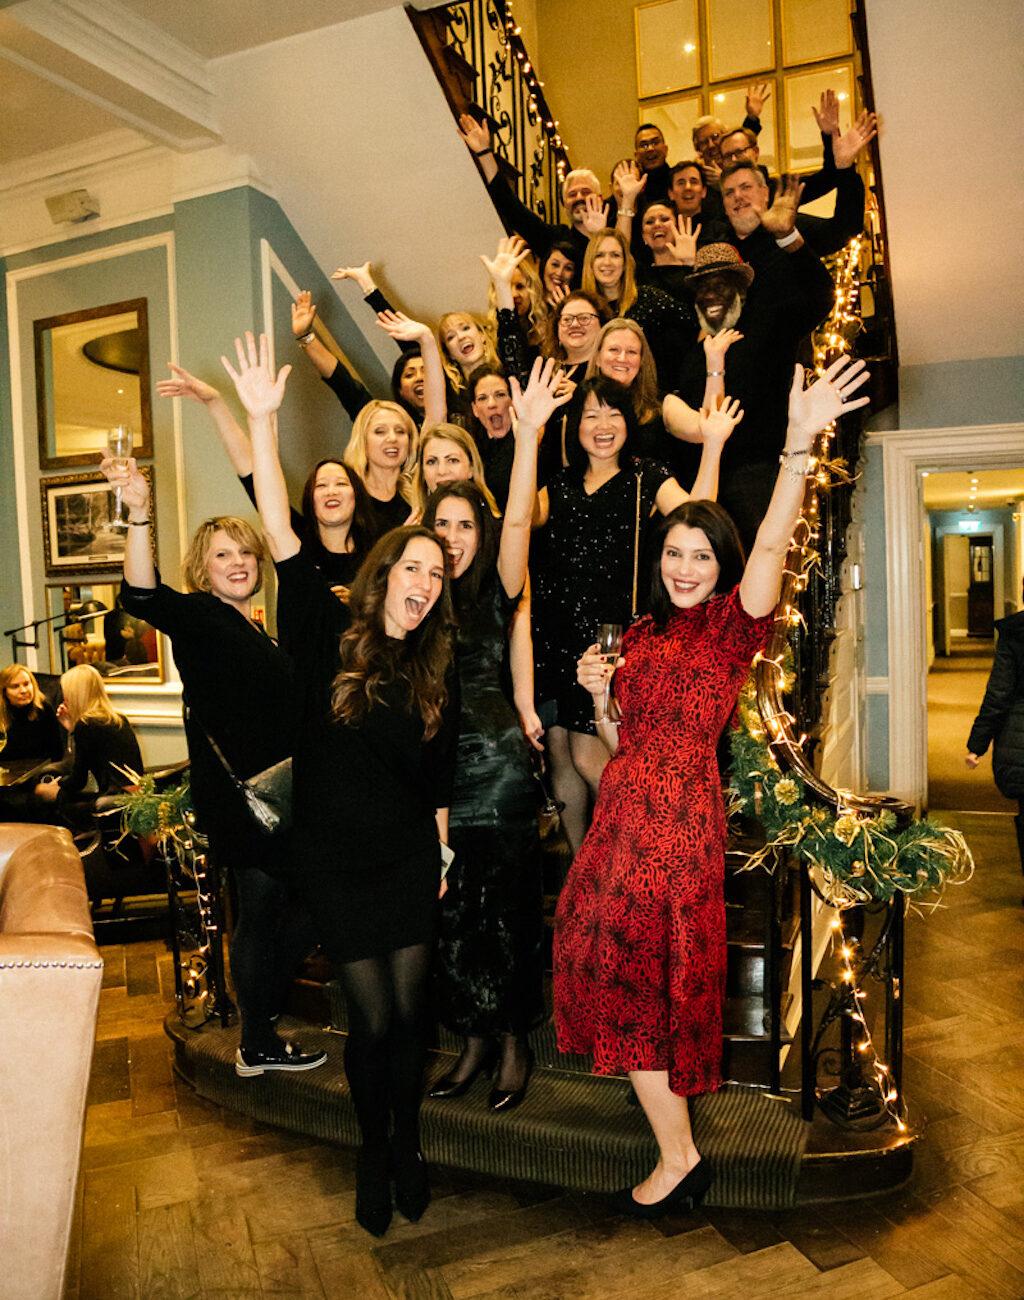 Lady Winbledom Christmas Party. Hotel du Vin. Wimbeldom. London. 04/12/2019. Photo: Alessandro Filizzola | www.alefilizzola.com